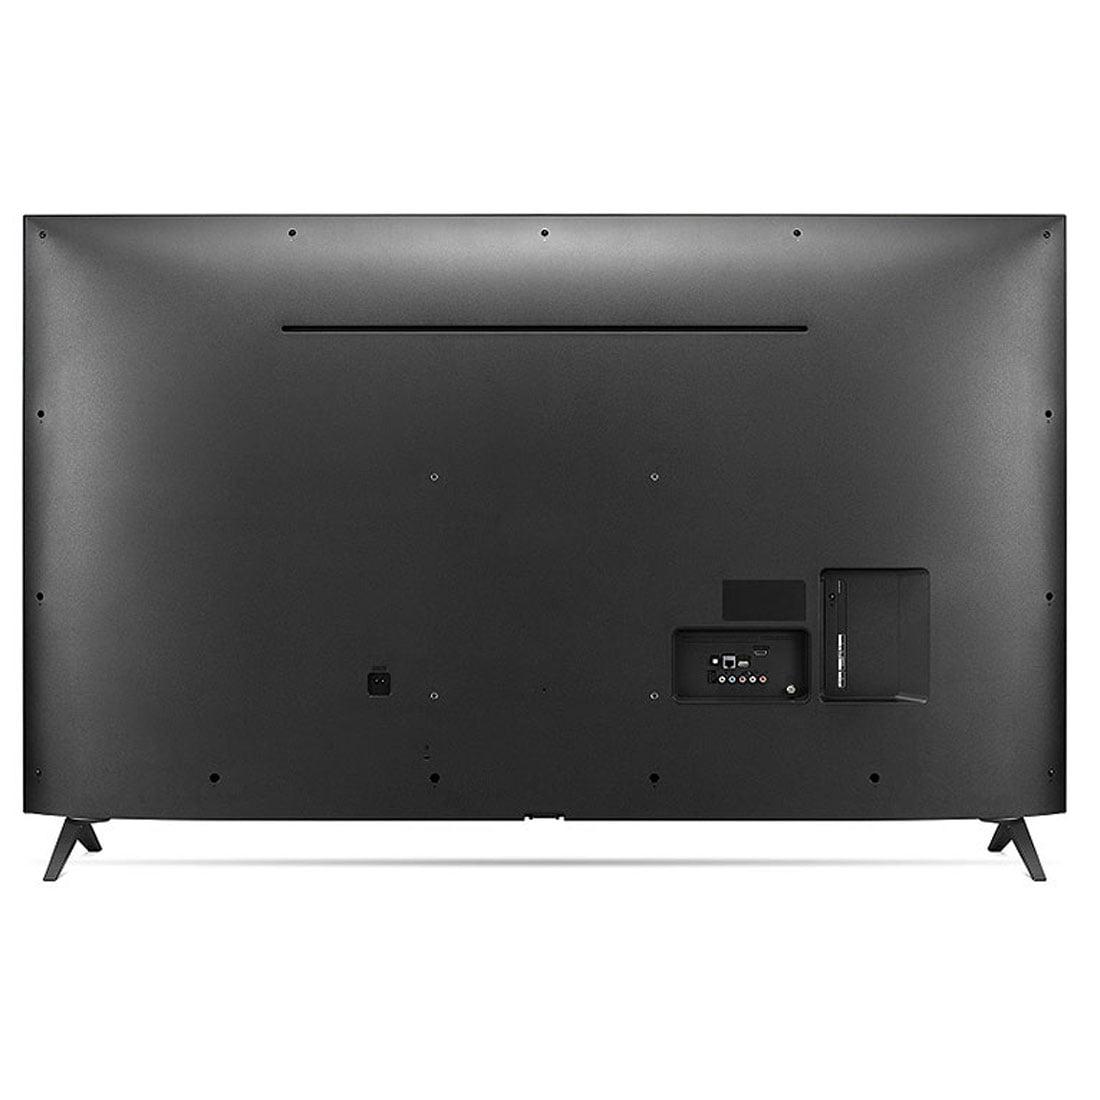 "Phd Smart Bar Test Smart Tv Led 32 Hd Samsung Hg32ne595jgxzd Hdtv Antenna Barrie Ontario Camera Sports Hd Dv 1080p H 264: LG 49UM7300 49"" Class HDR 4K UHD Smart TV"